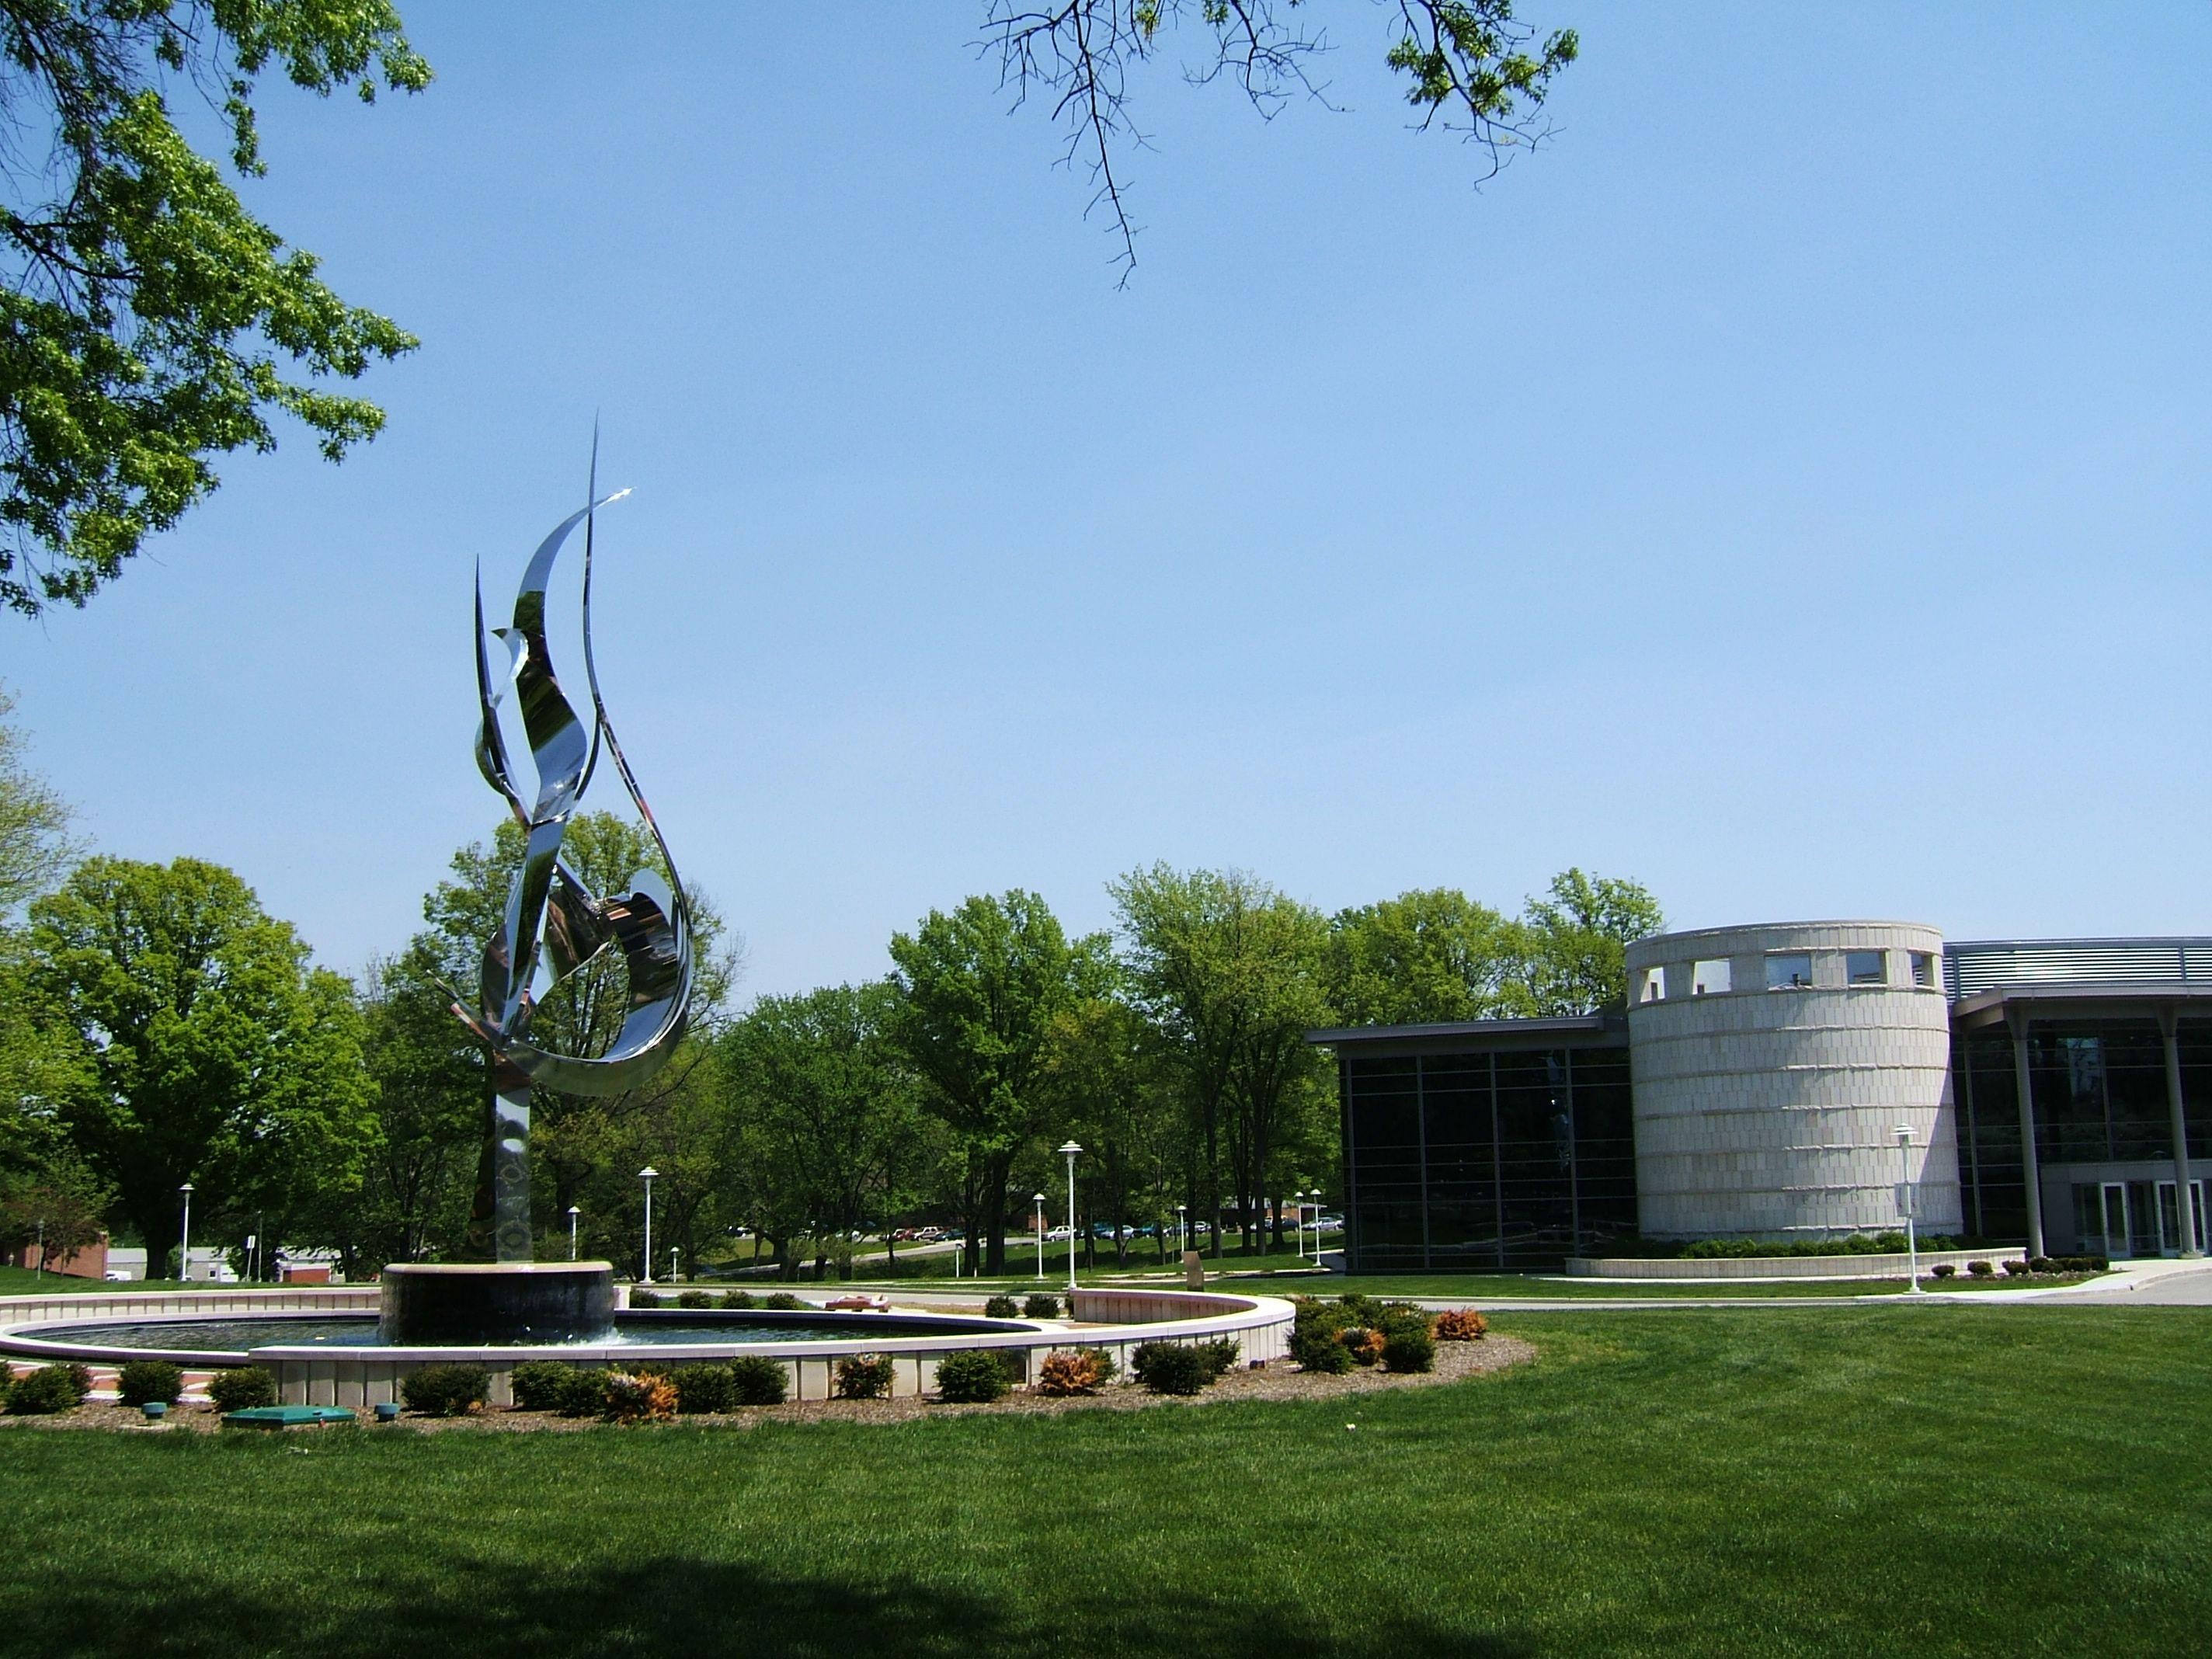 2.Terre Haute, Indiana